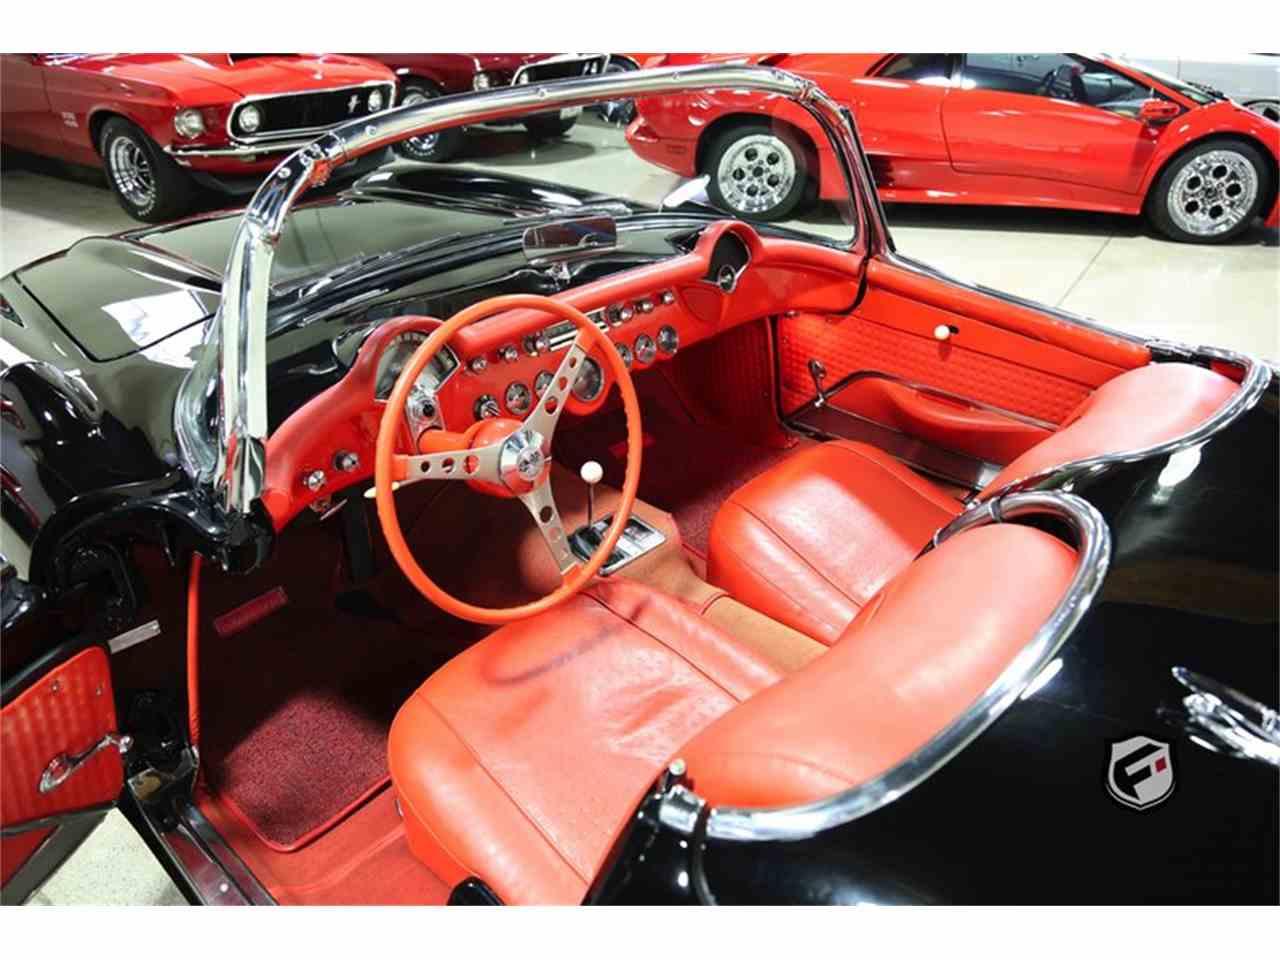 Large Picture of Classic '57 Chevrolet Corvette located in California - $99,900.00 - MBTJ